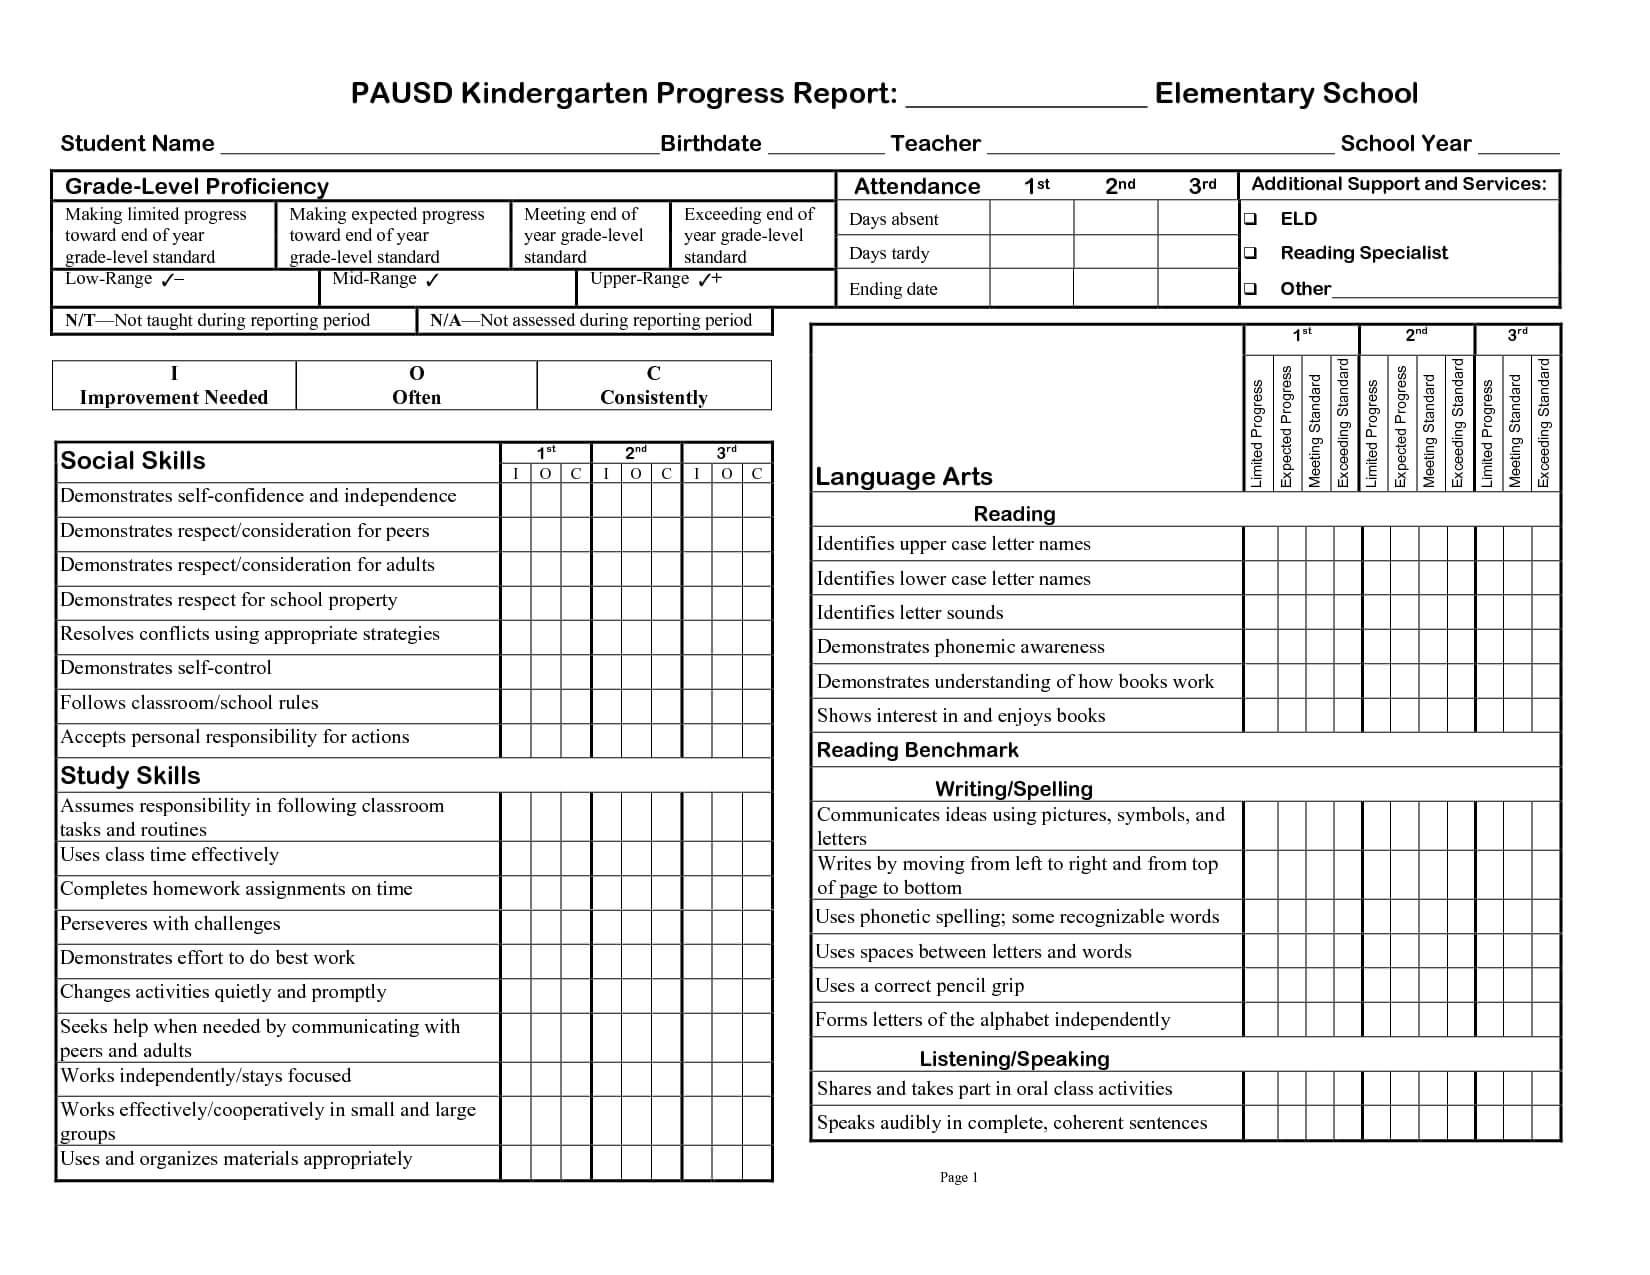 Kindergarten Social Skills Progress Report Blank Templates Regarding School Progress Report Template